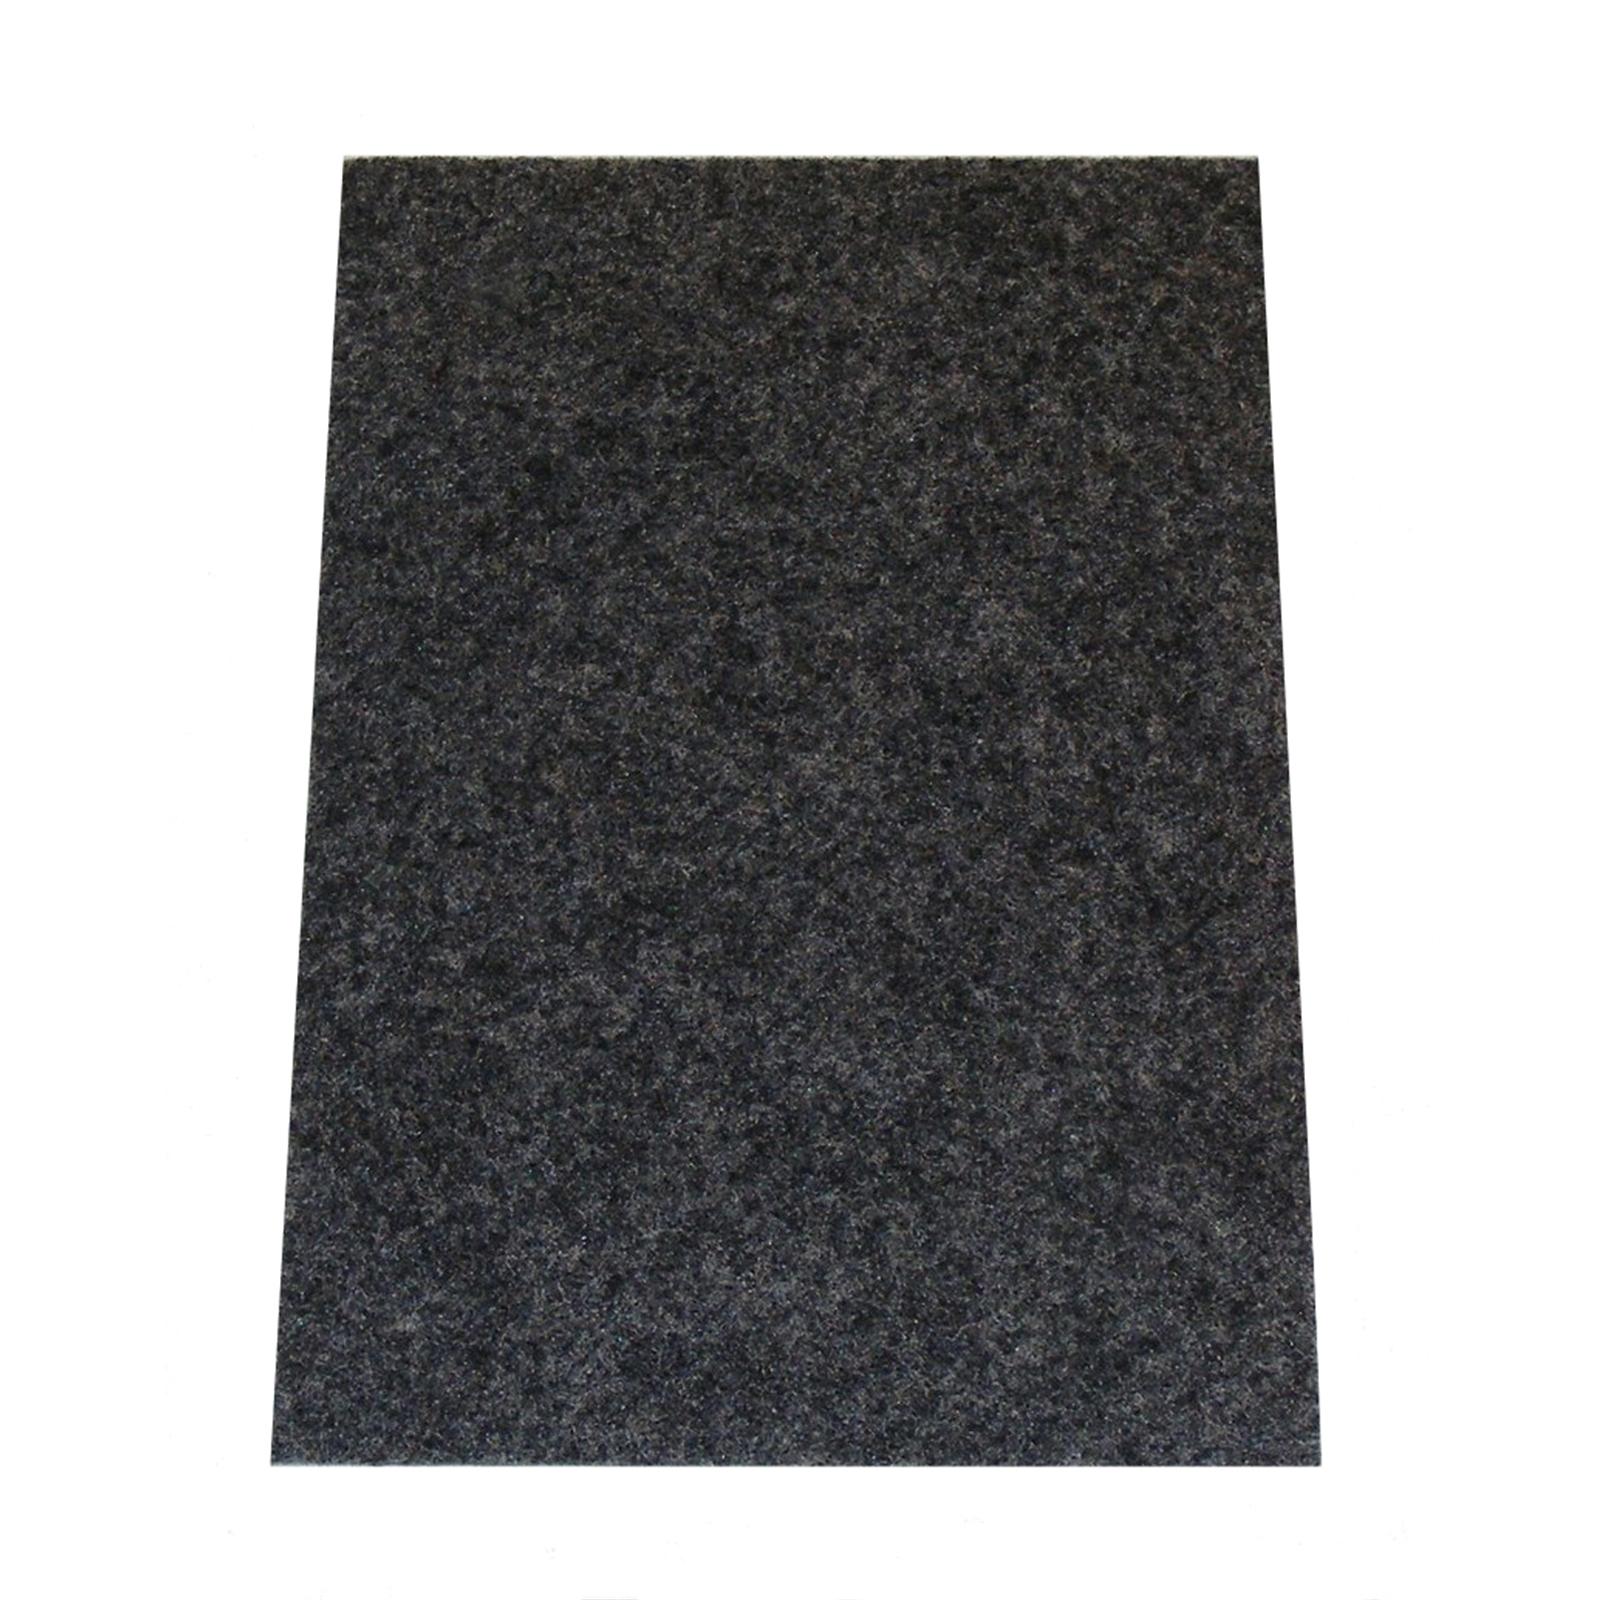 Ideal DIY Eildon Charcoal Flat Marine Carpet